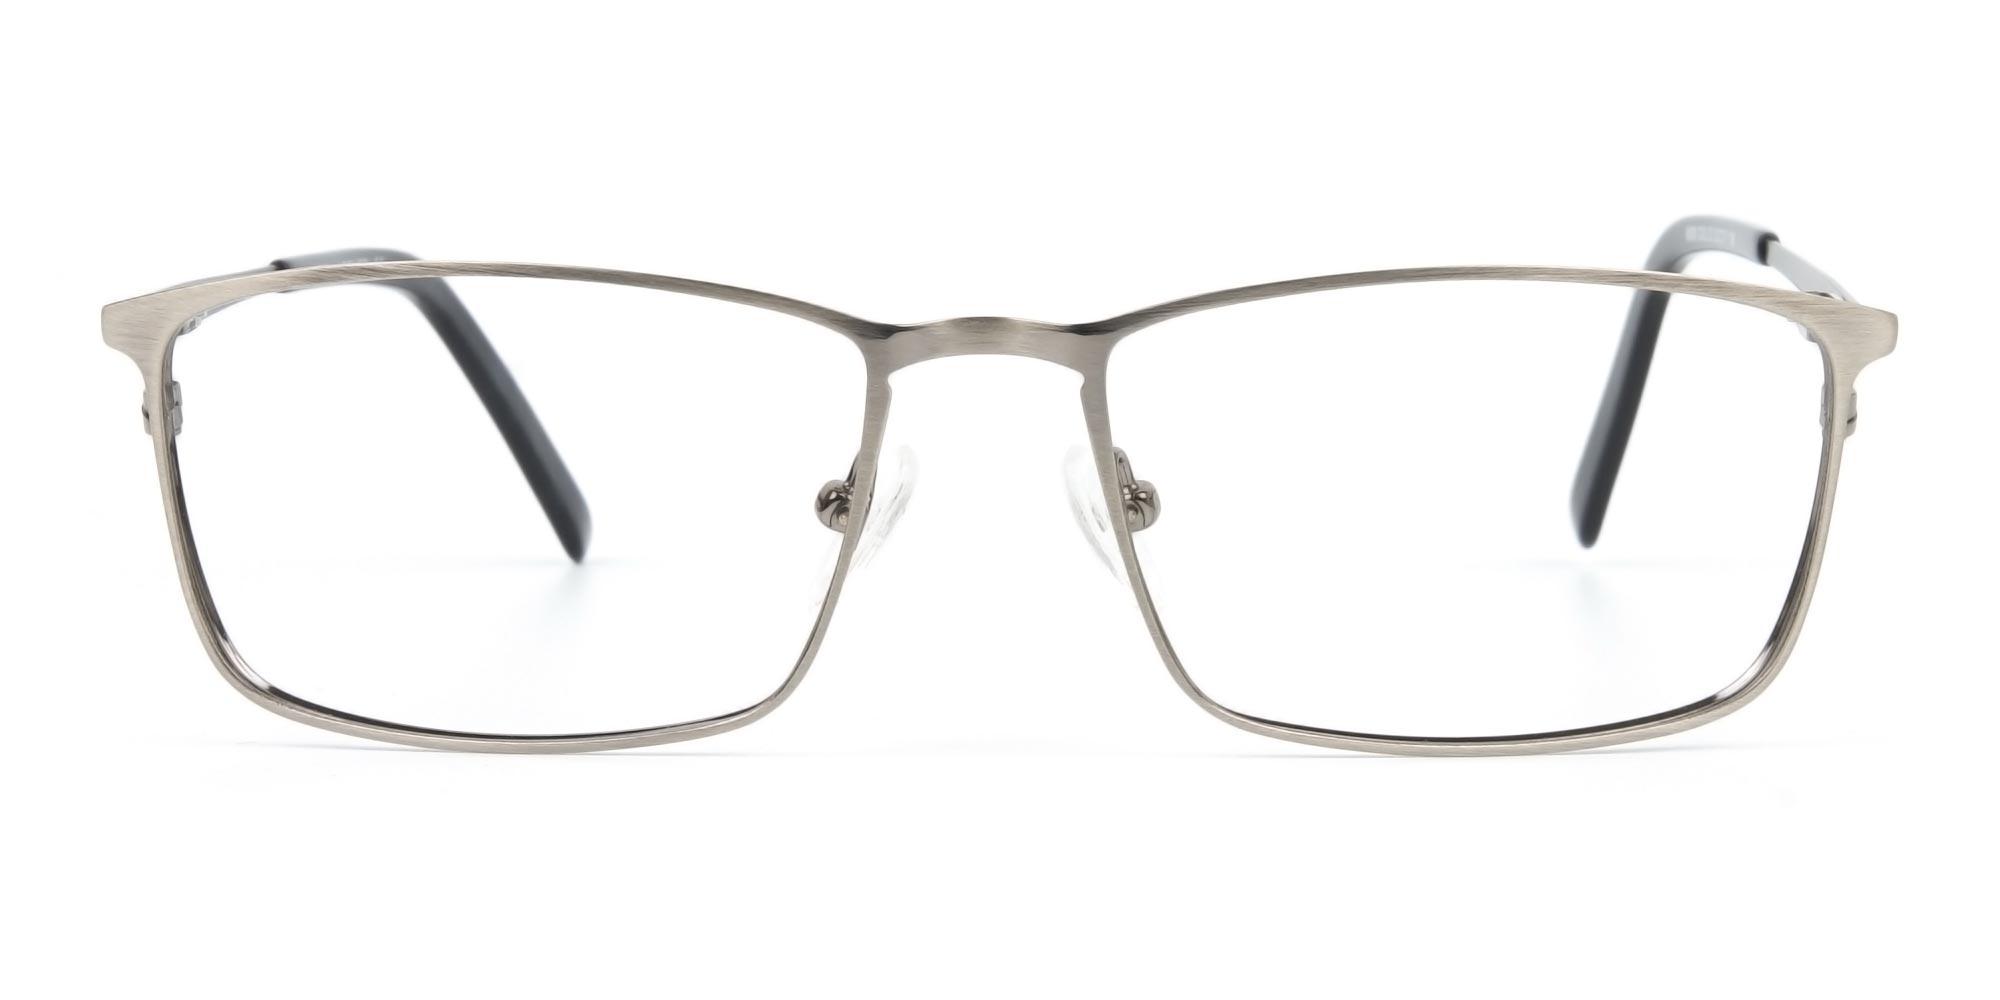 Gunmetal Rectangular Glasses with Black Temple